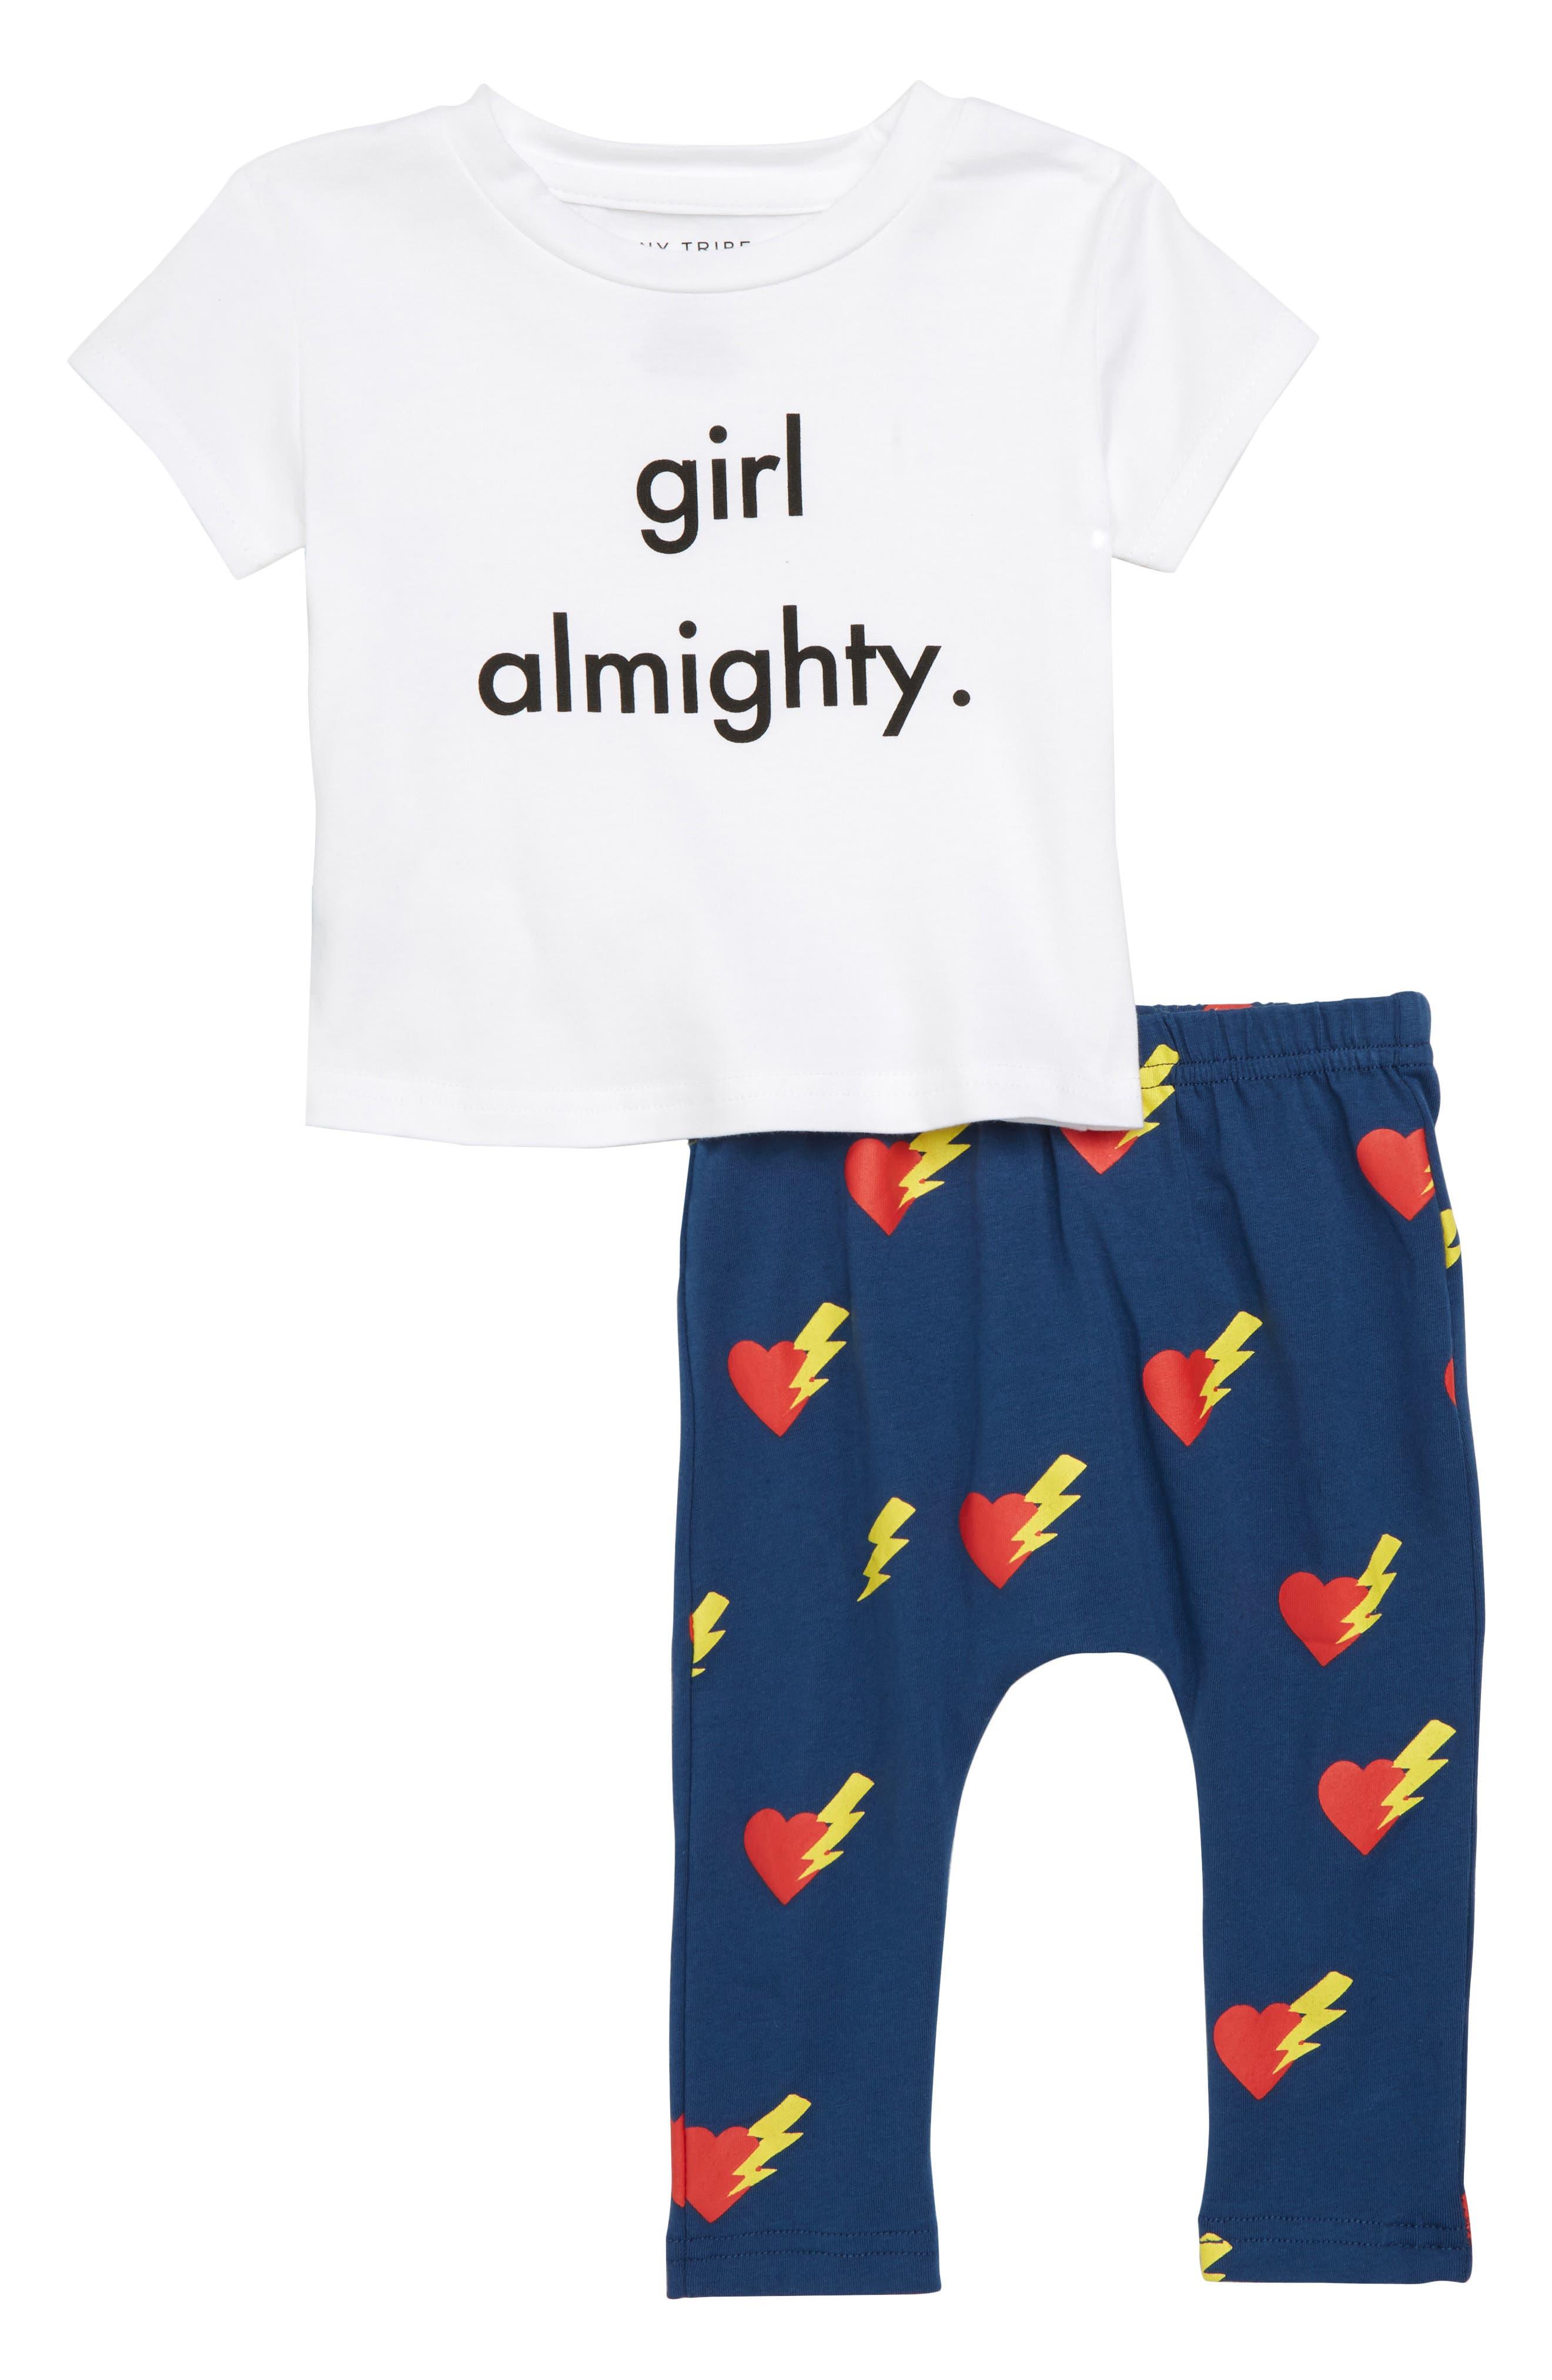 Girls Almighty Tee & Leggings Set,                             Main thumbnail 1, color,                             White/ Navy